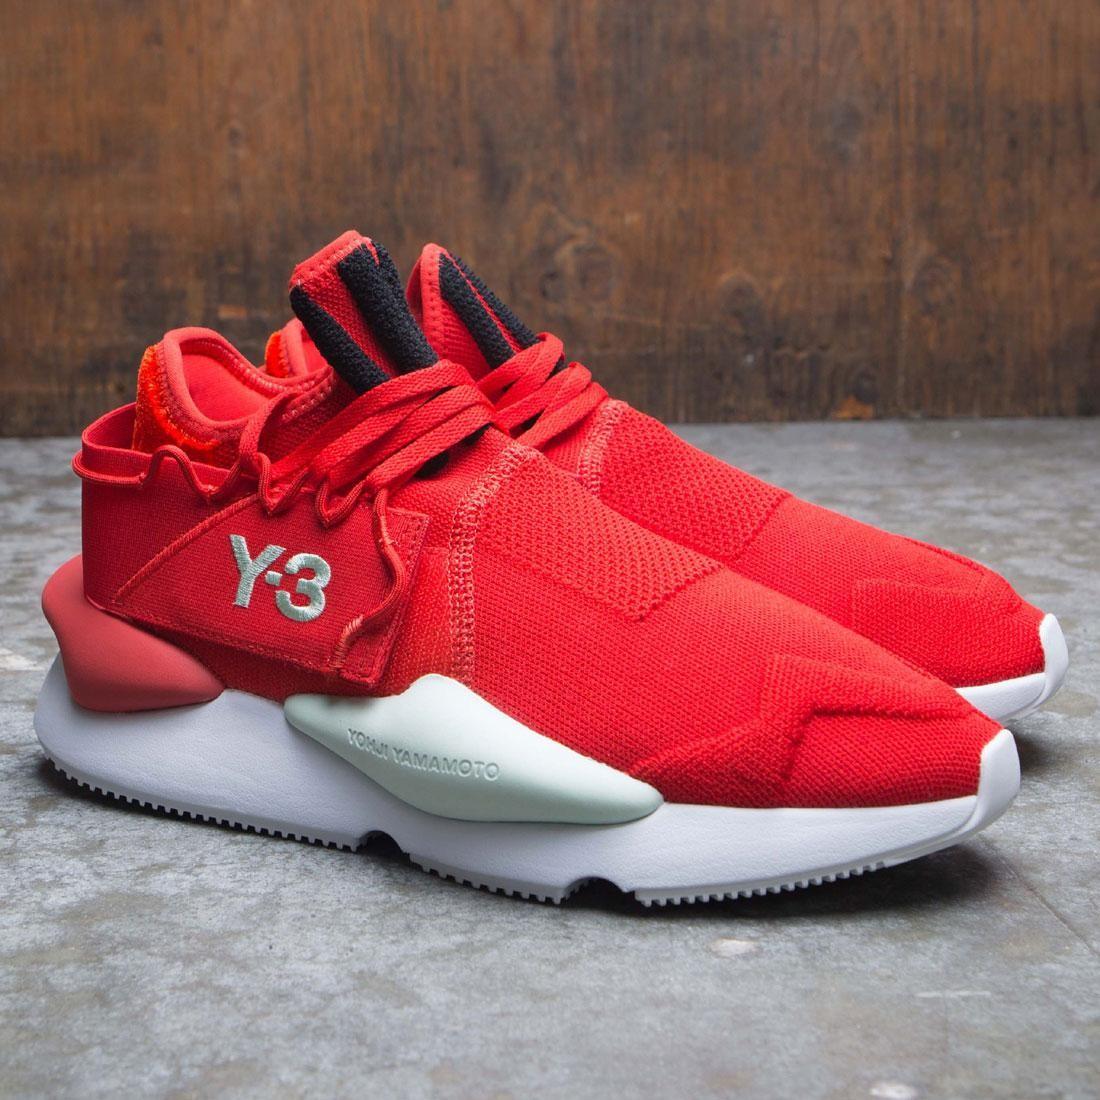 Adidas Y-3 Men Kaiwa Knit red core